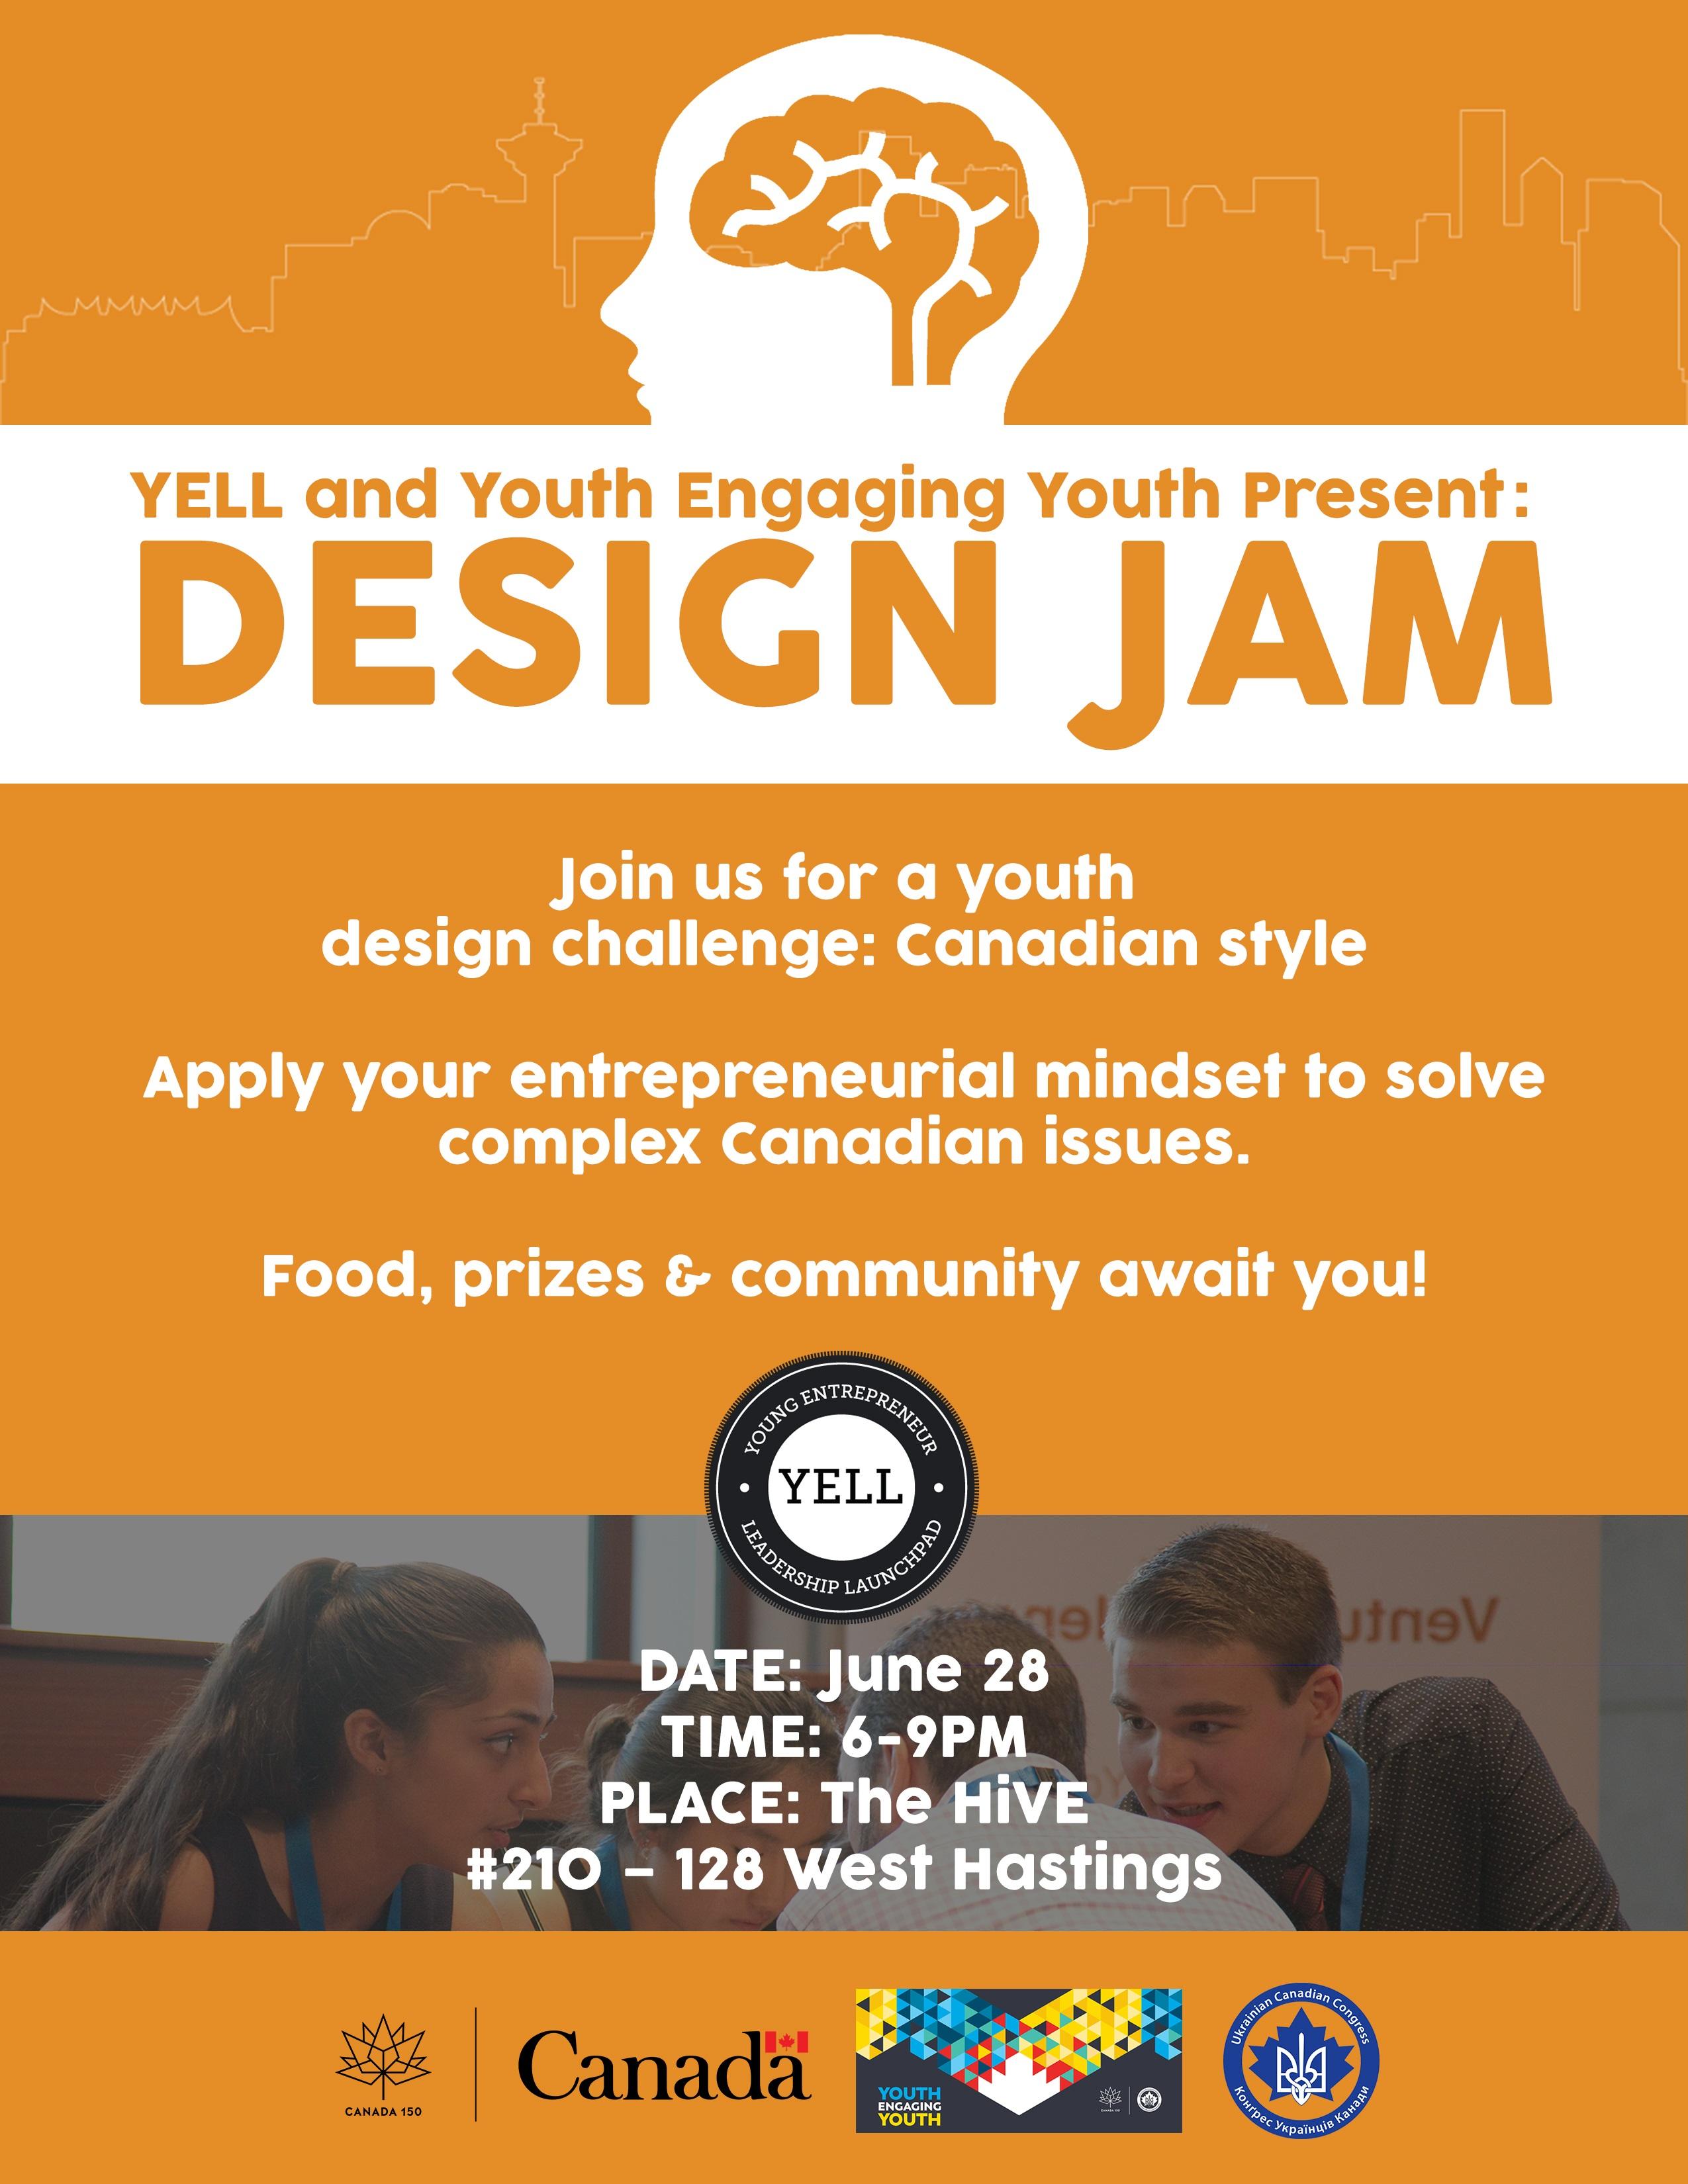 Canadian Youth Design Jam